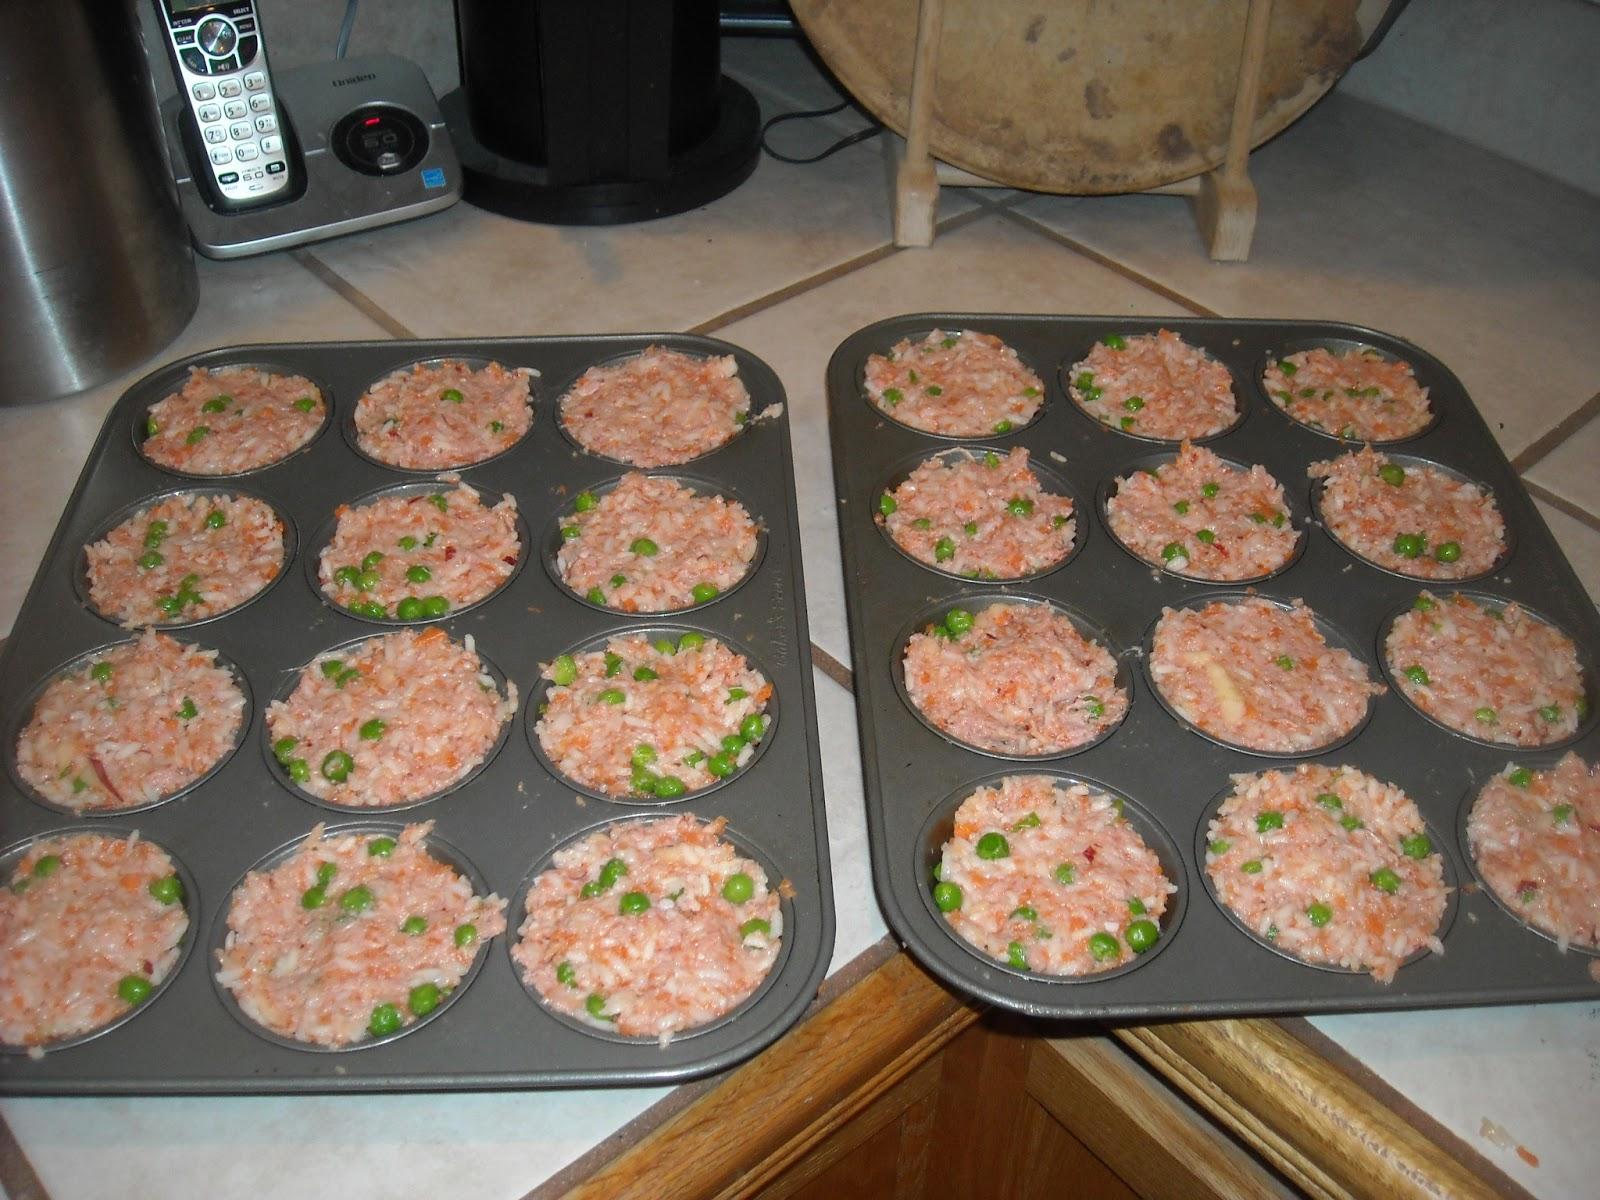 How To Make Homemade Dog Food With Ground Turkey